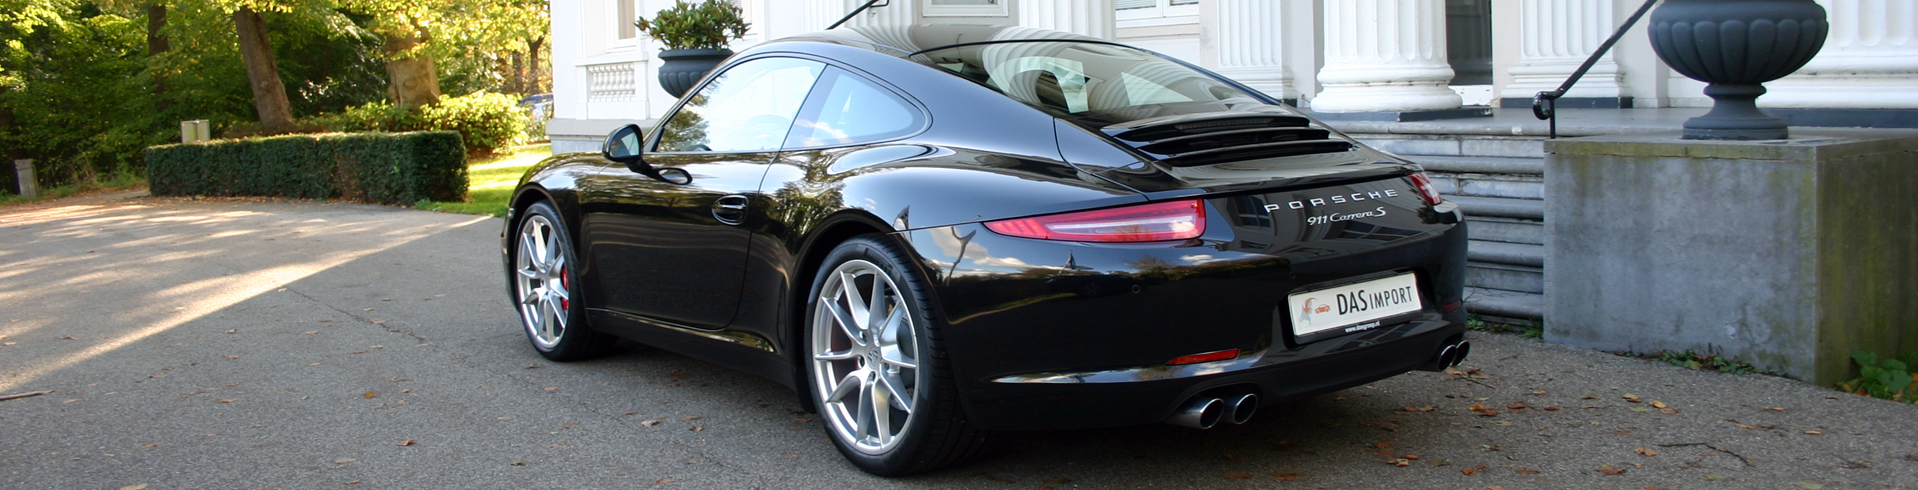 3.-Porsche-911-Carrera-S